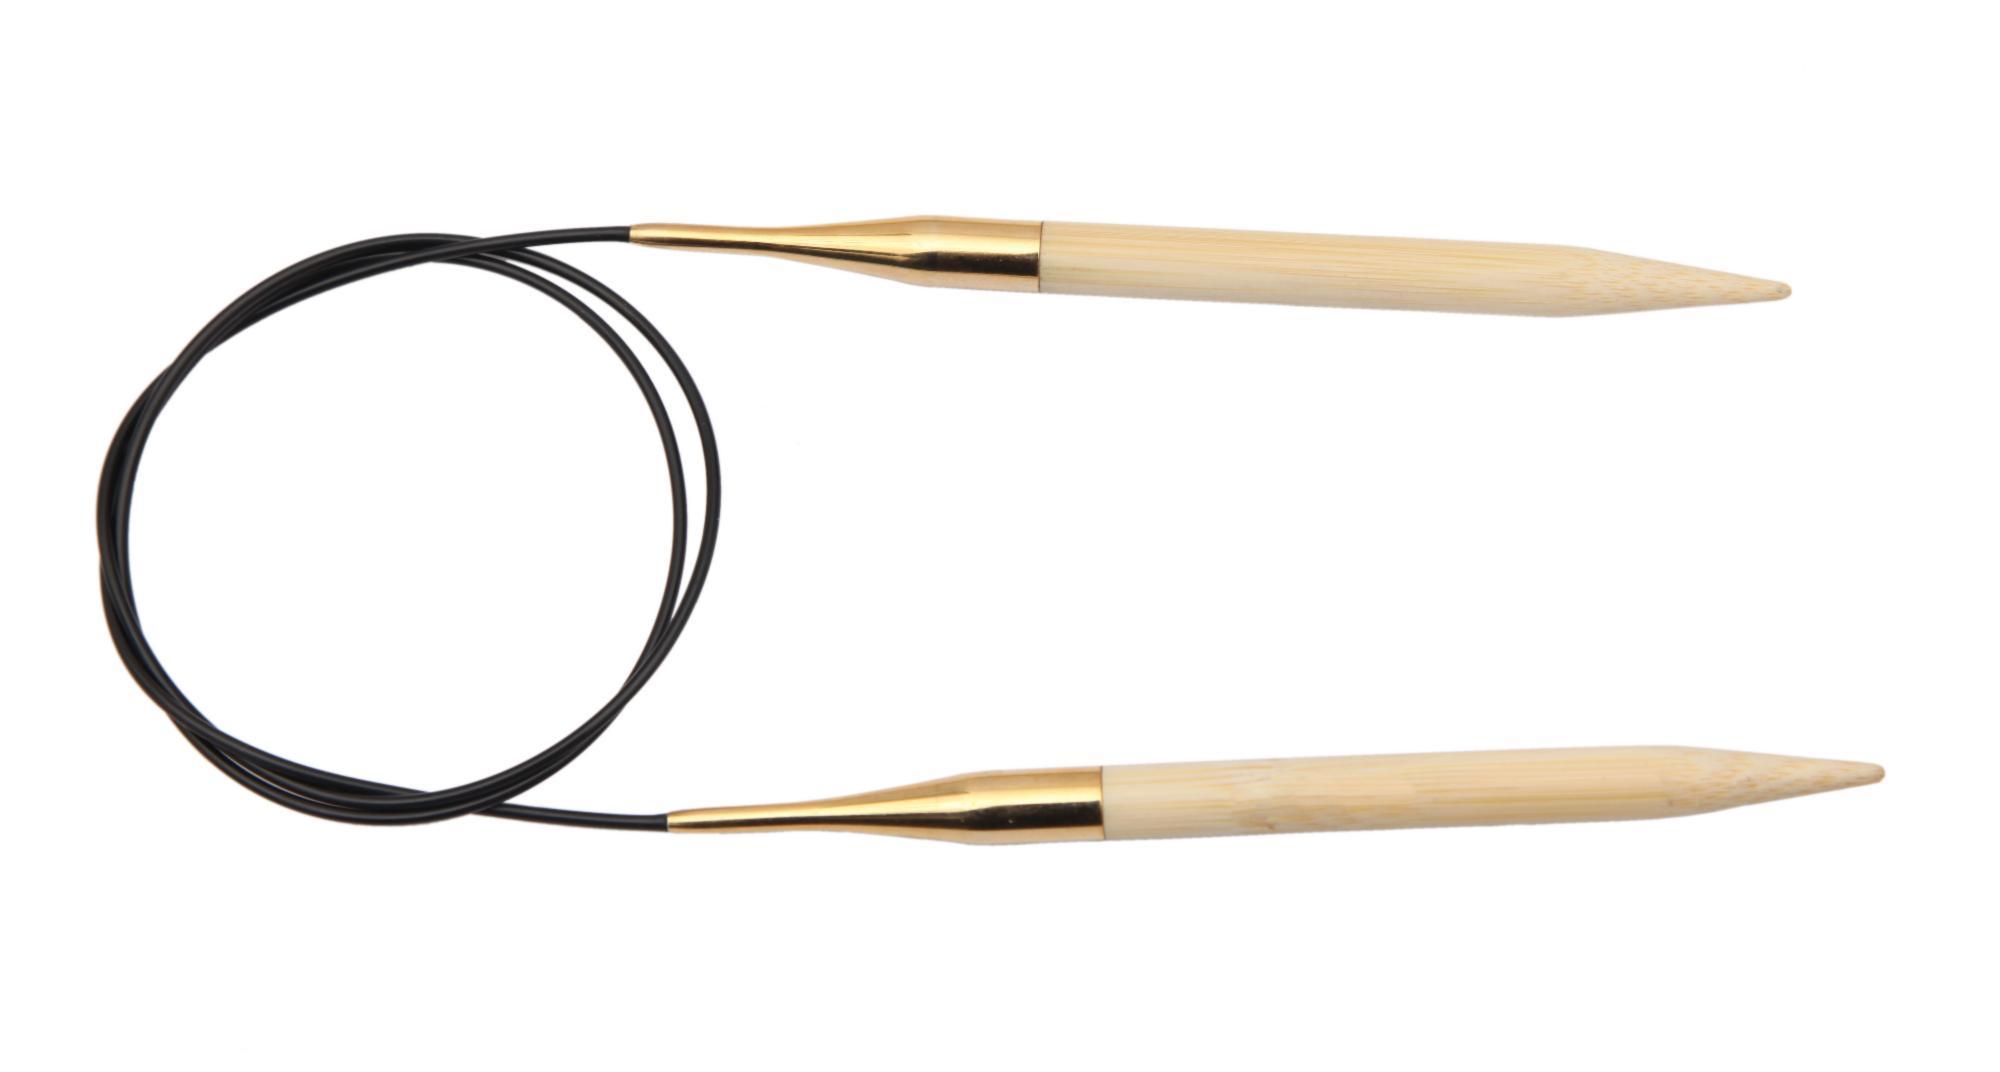 Спицы круговые 100 см Bamboo KnitPro, 22266, 3.50 мм